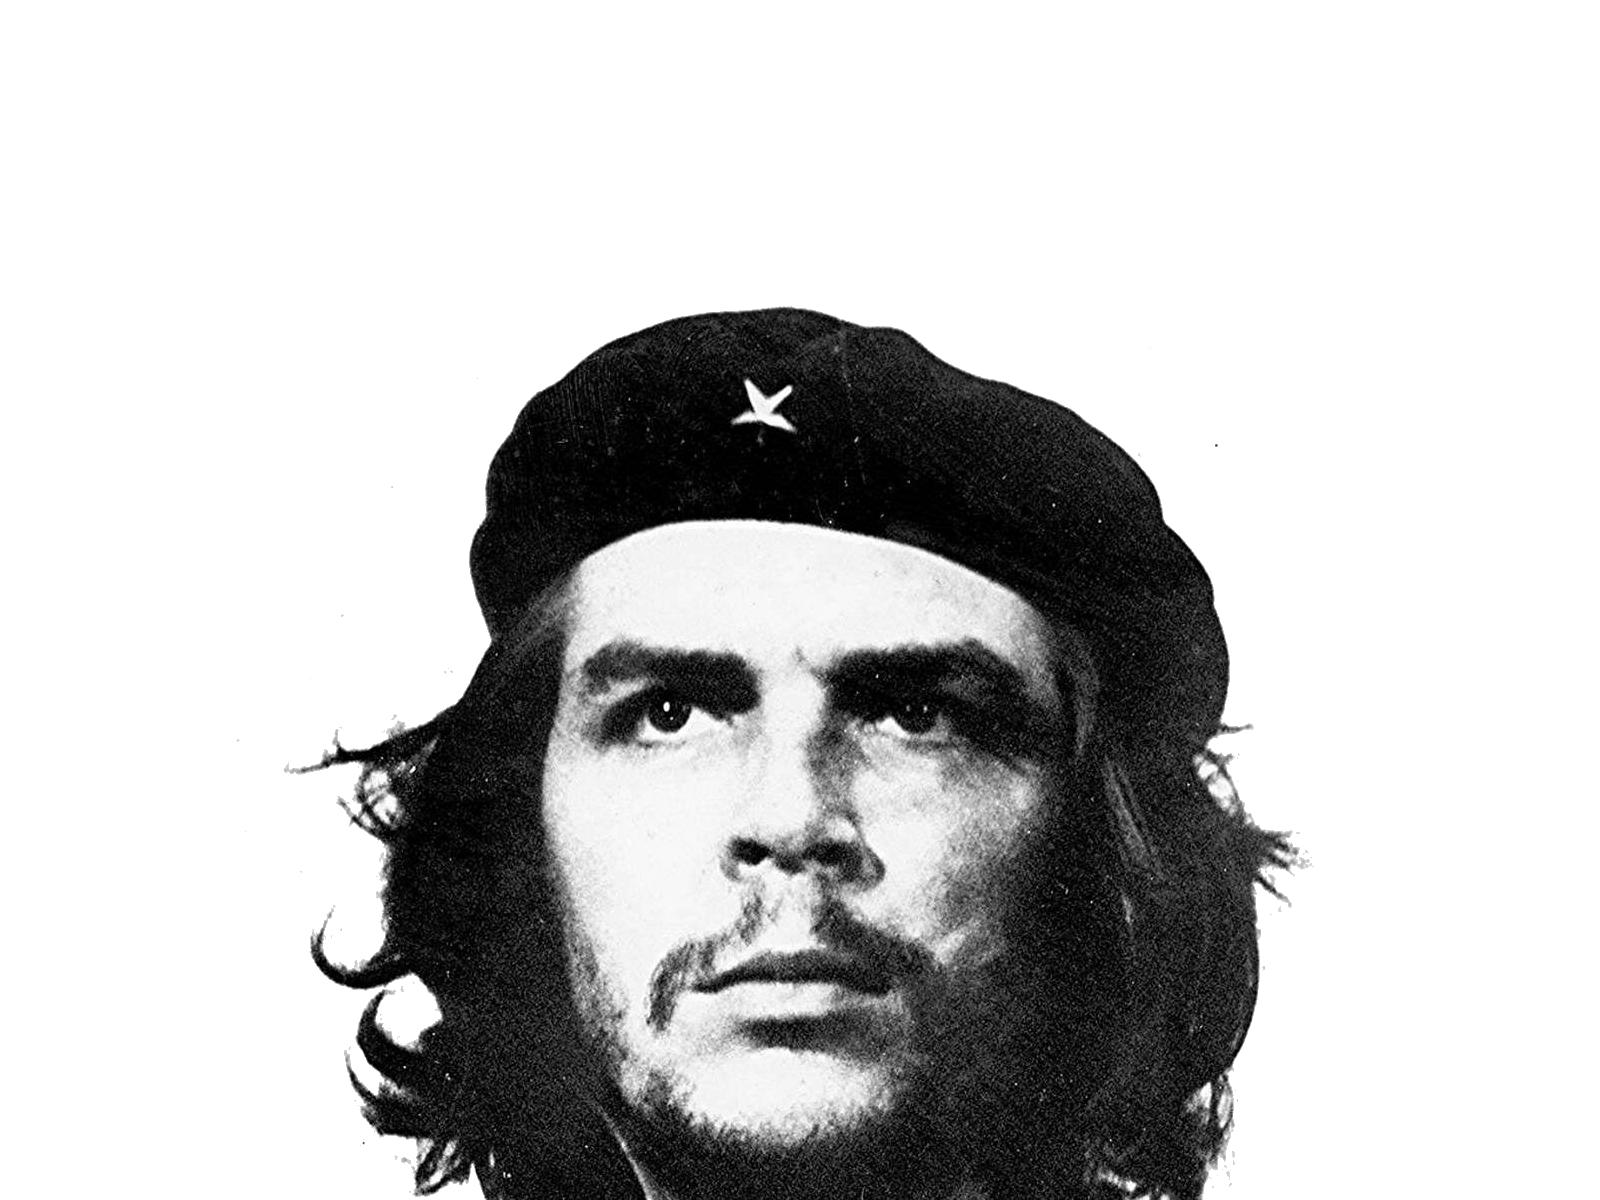 Che Guevara Png Image Che Guevara Image Png Images